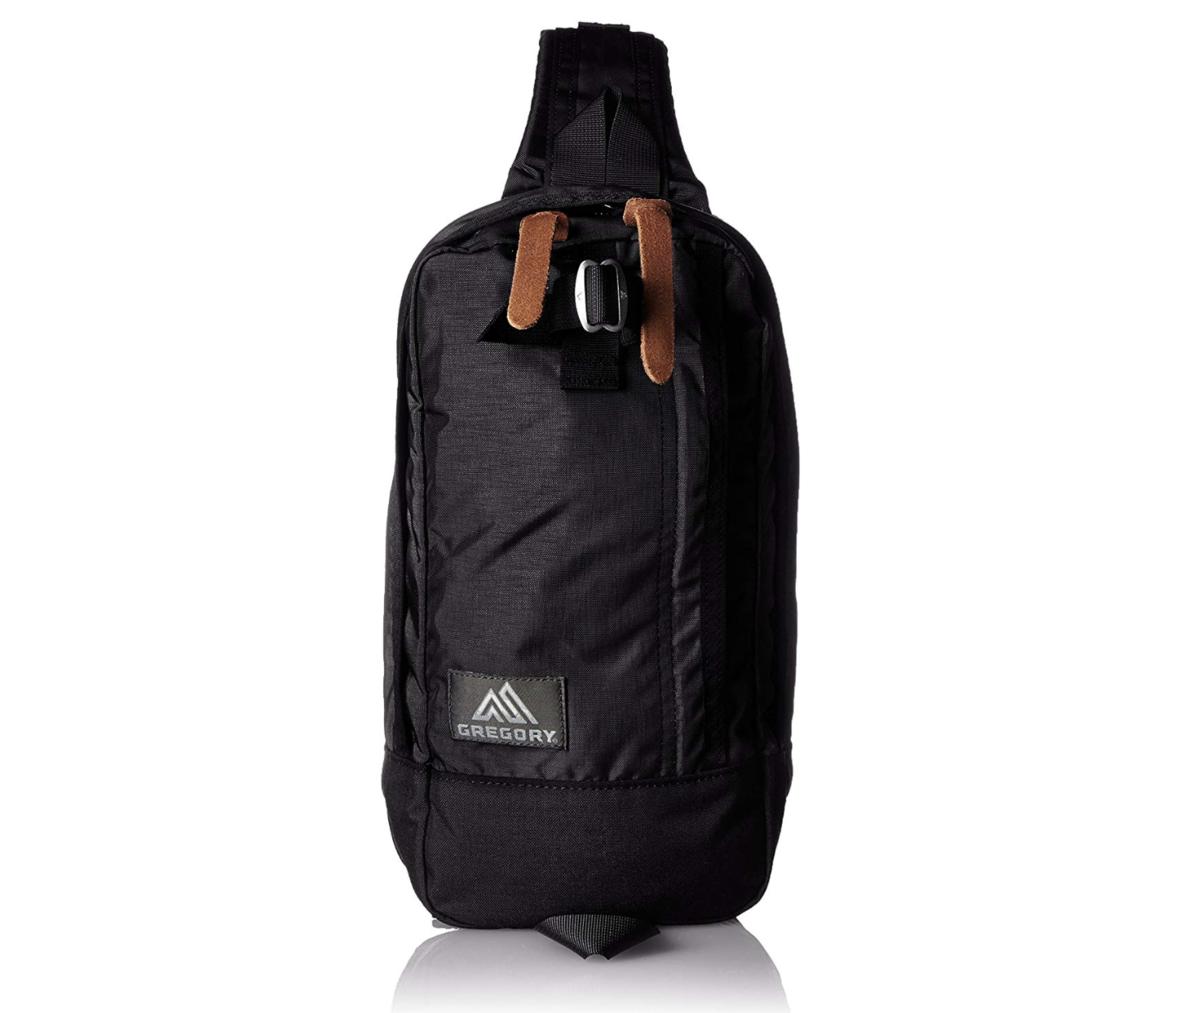 f:id:thebackpack:20190930202856p:plain